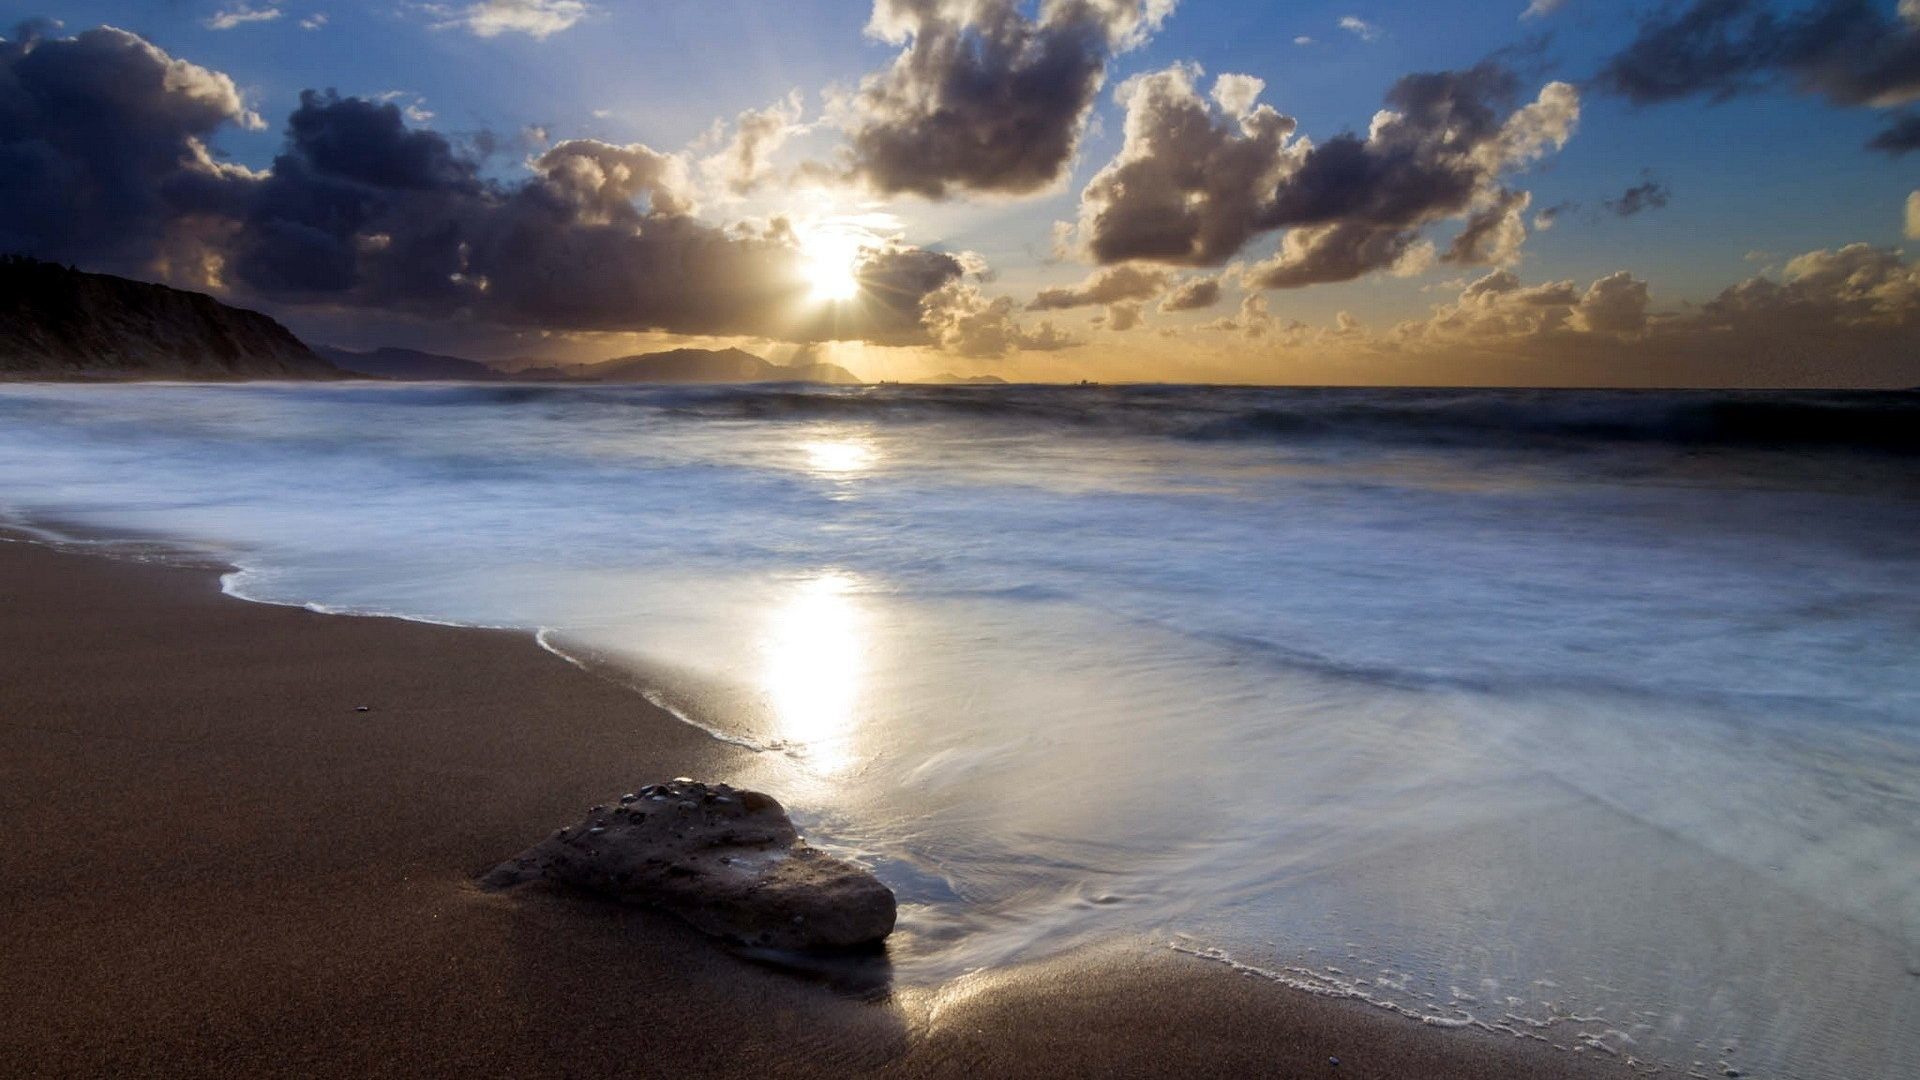 Beaches – Nature Sunset Splendor View Rays Sand Ocean Reflection Sun  Beautiful Peaceful Waves Clouds Beauty